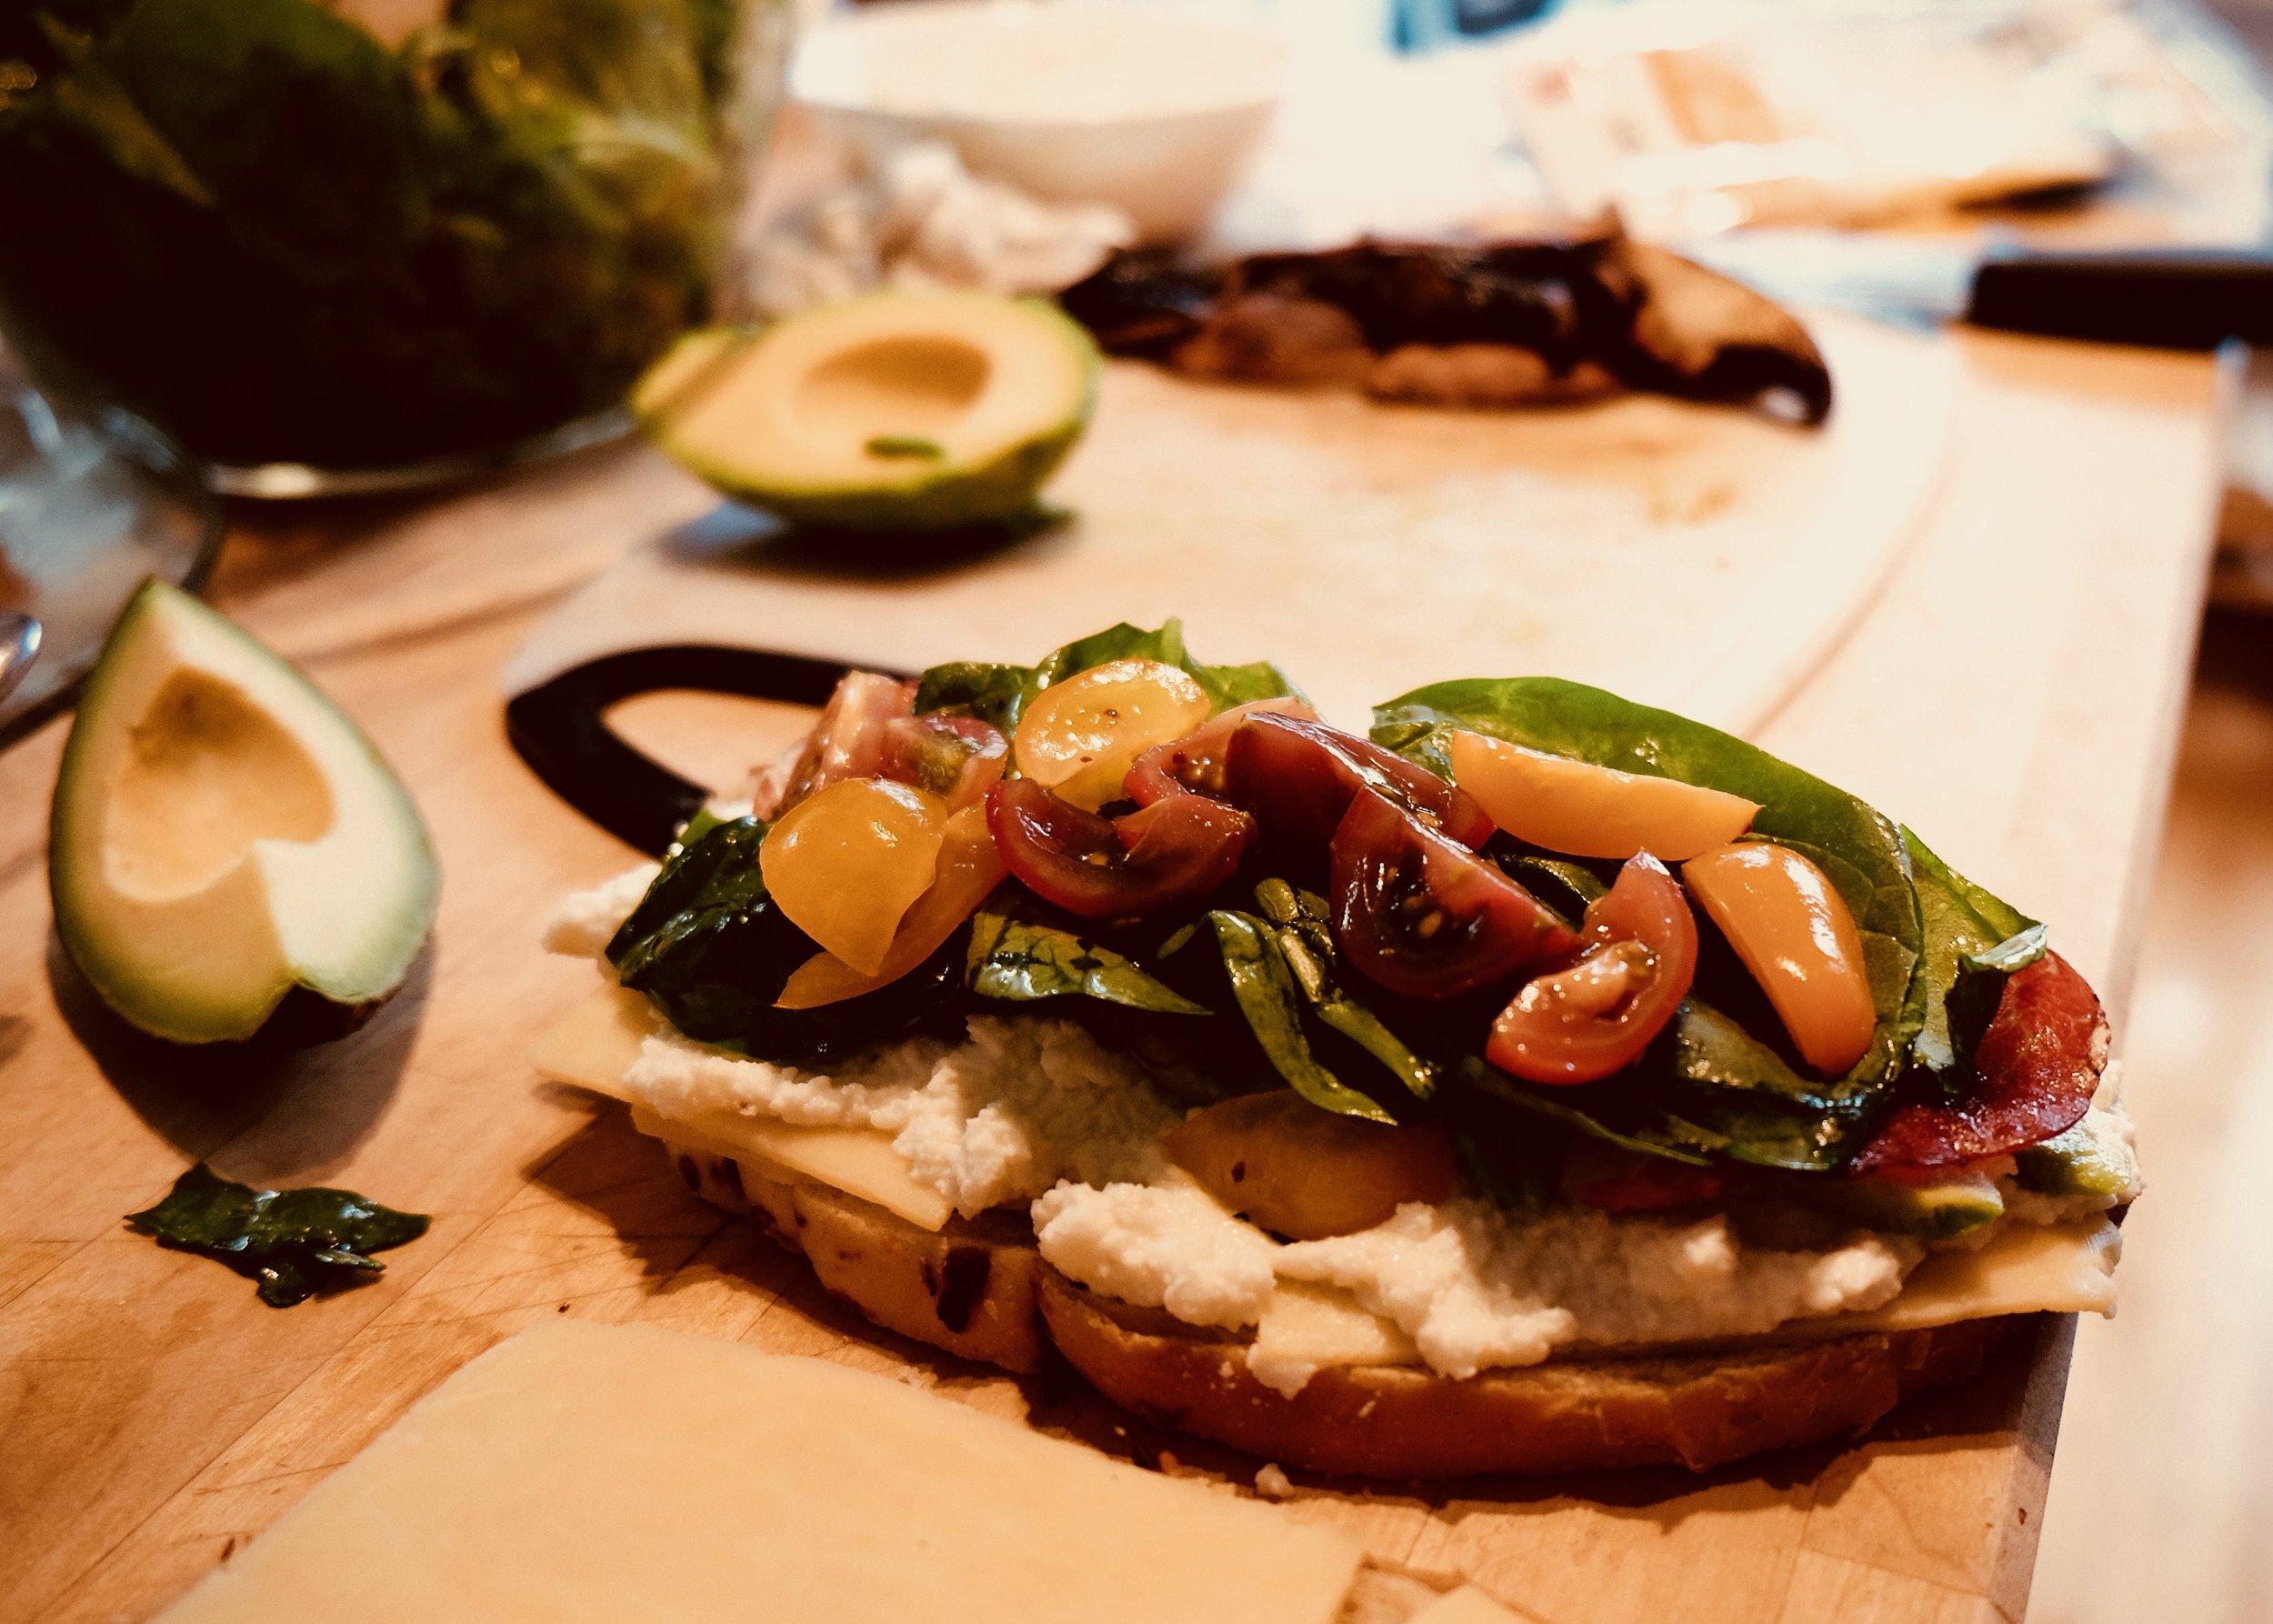 bread-food-sandwich-healthy (1).jpg